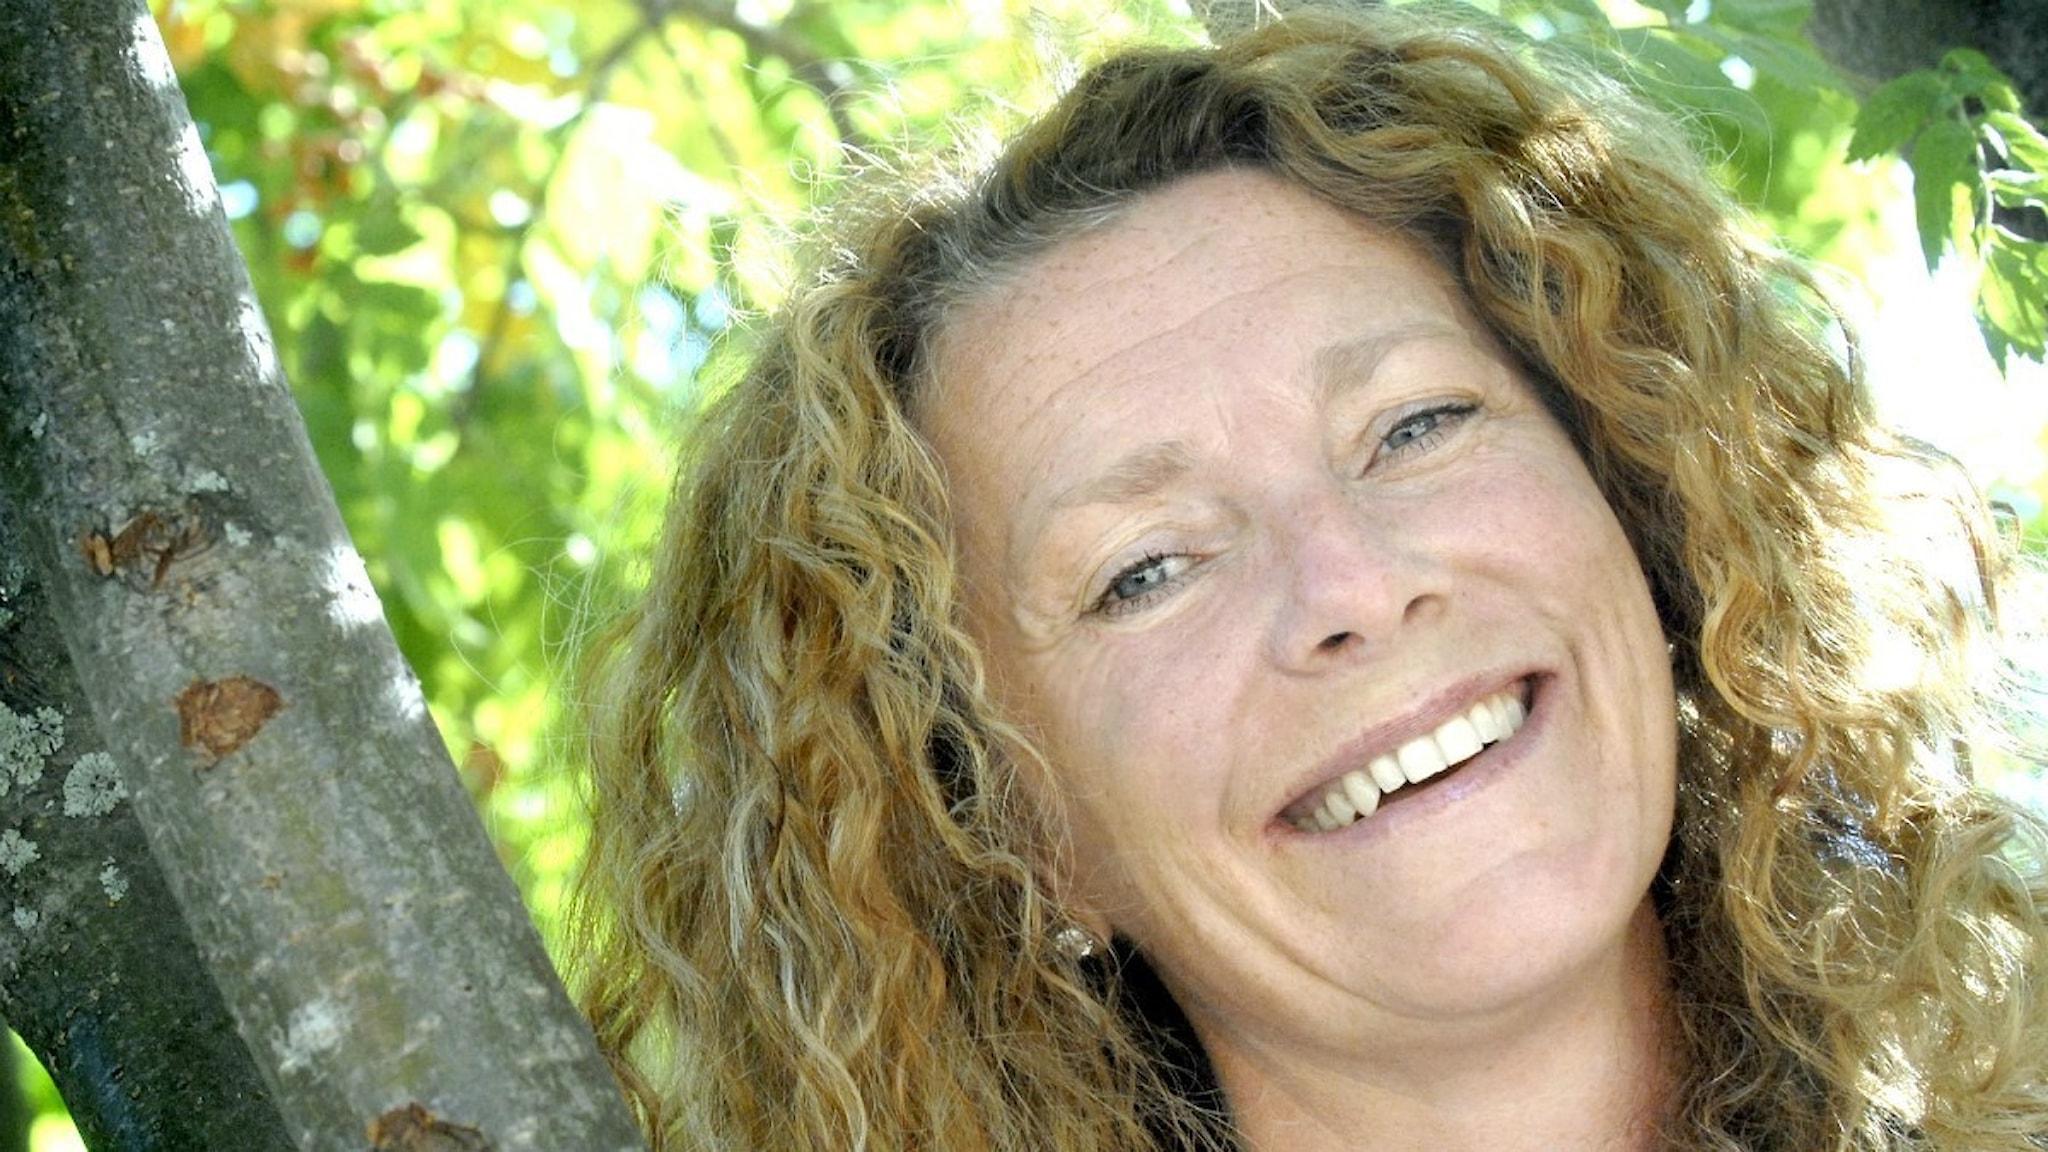 Marianne Söderberg, frilansskribent i Luleå. Foto: Eija Dunder